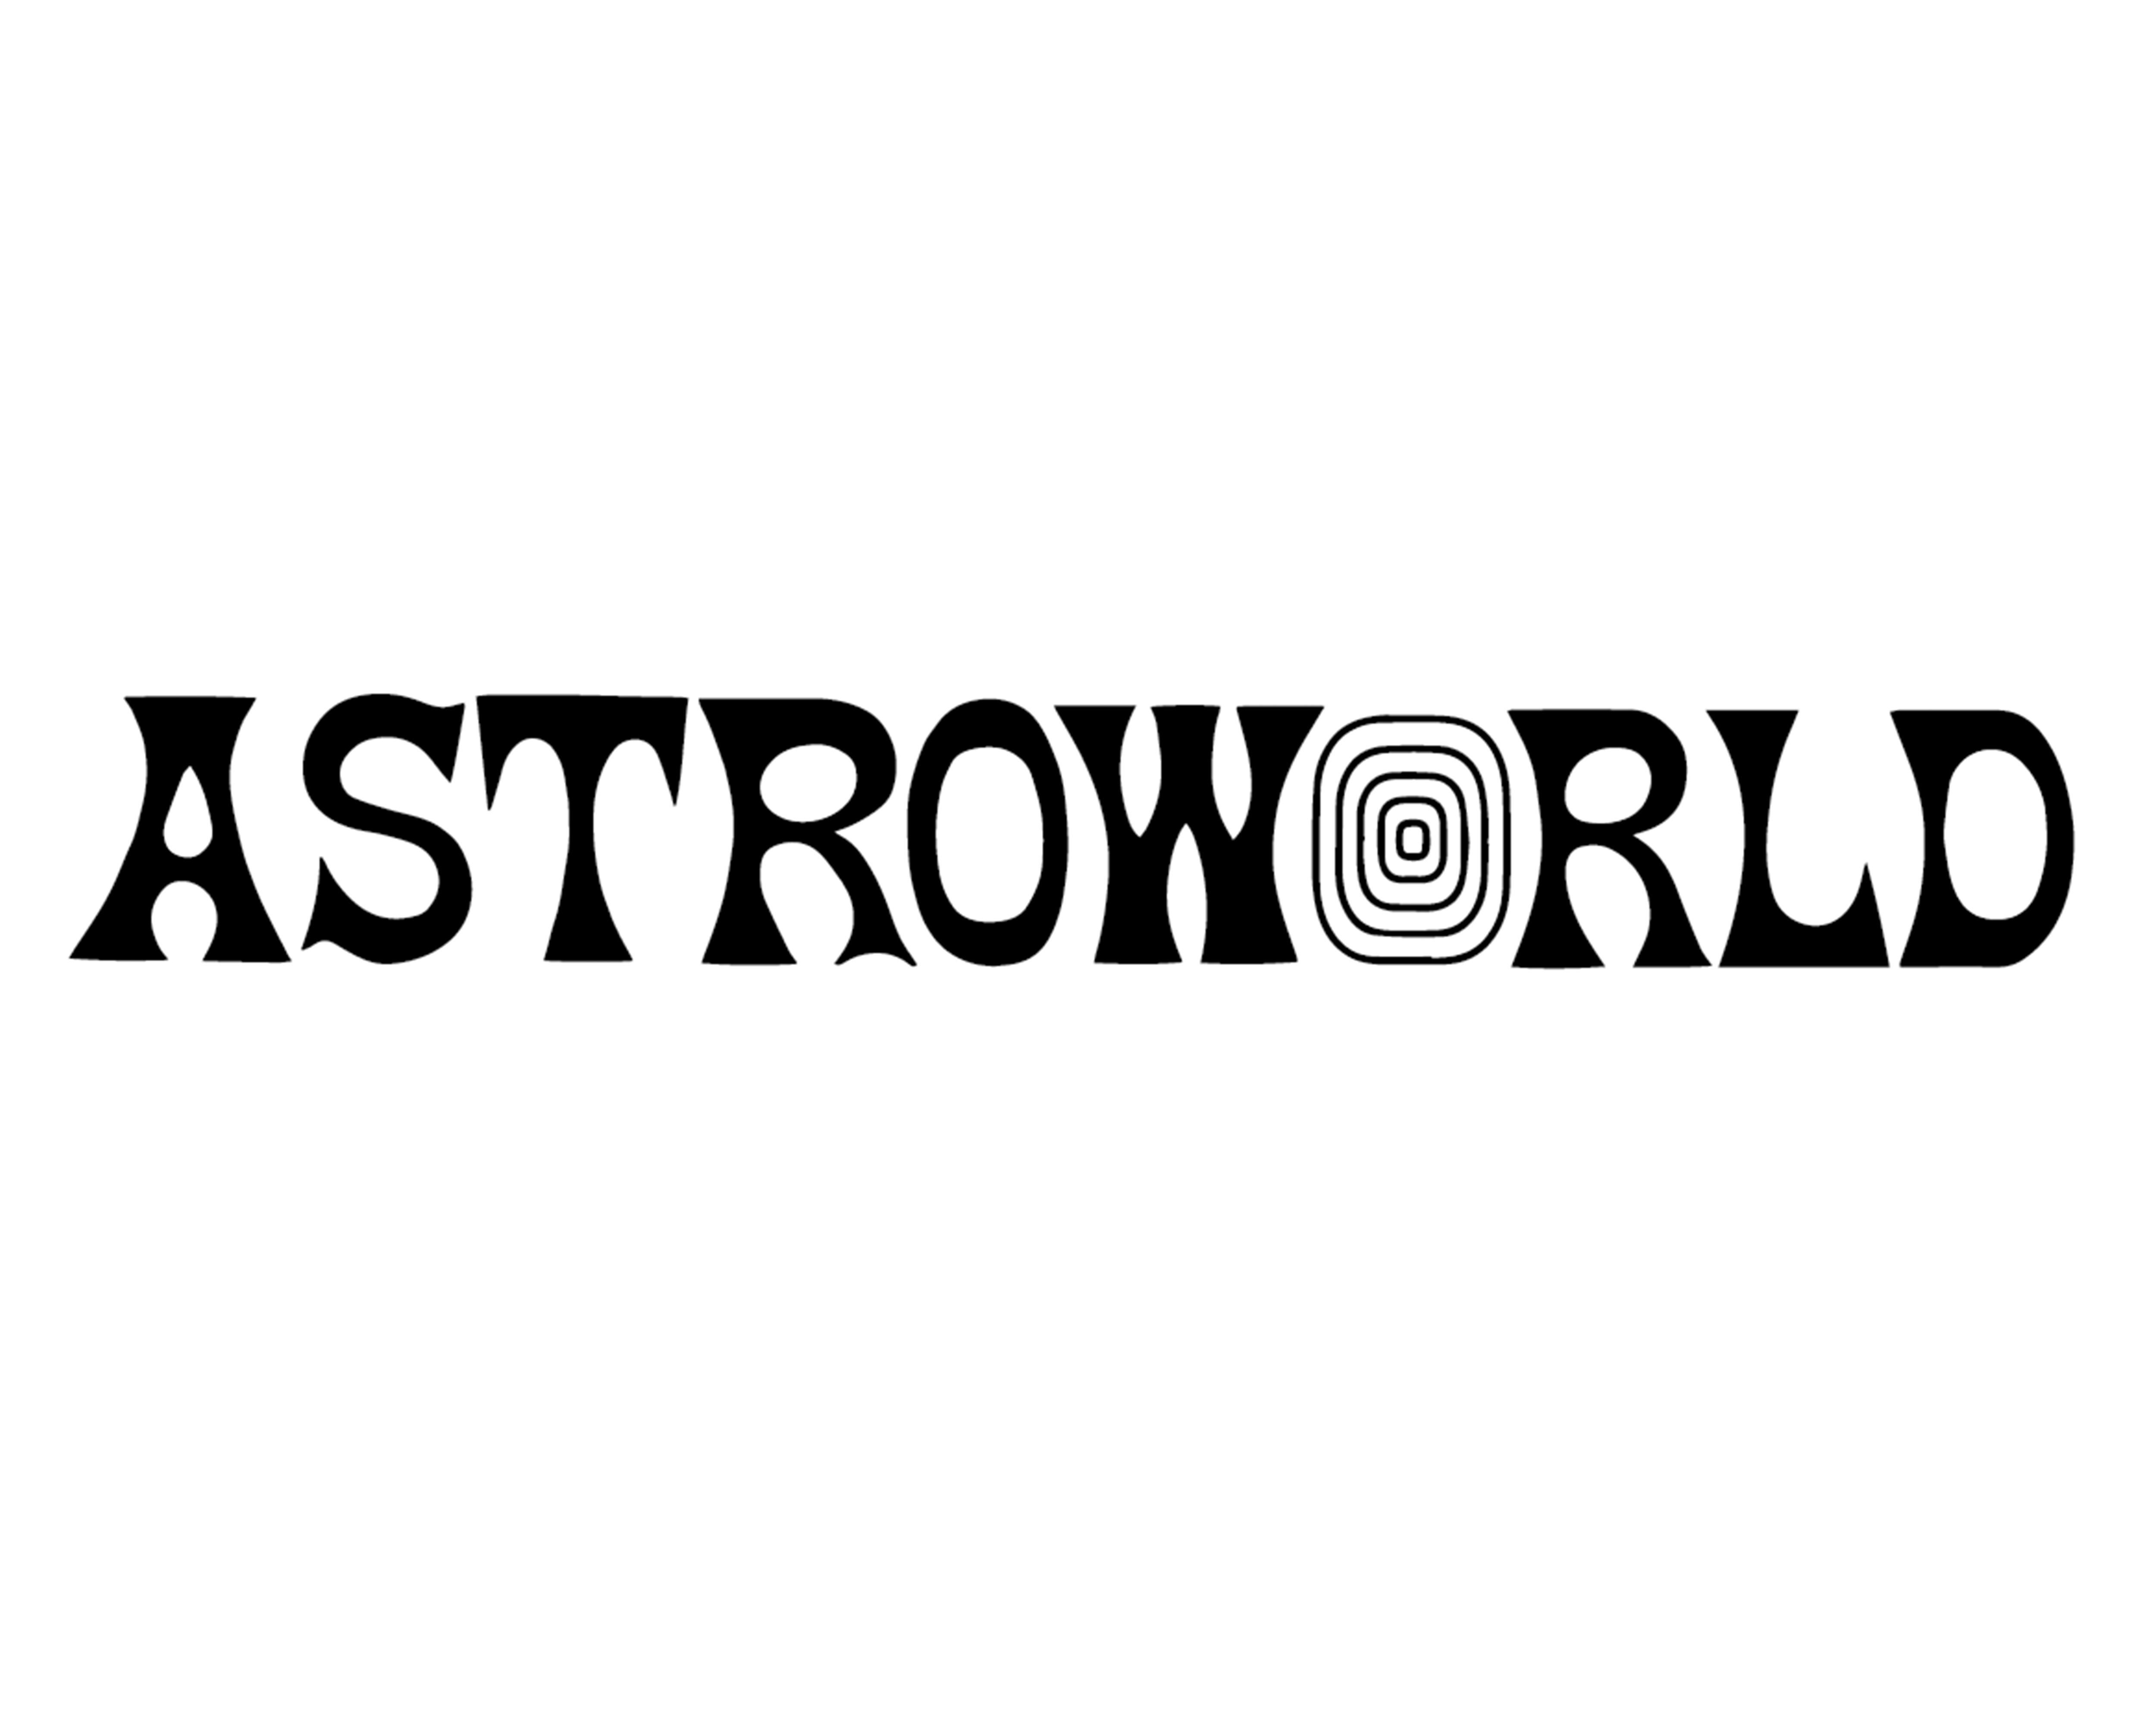 Astroworld Logo Logodix